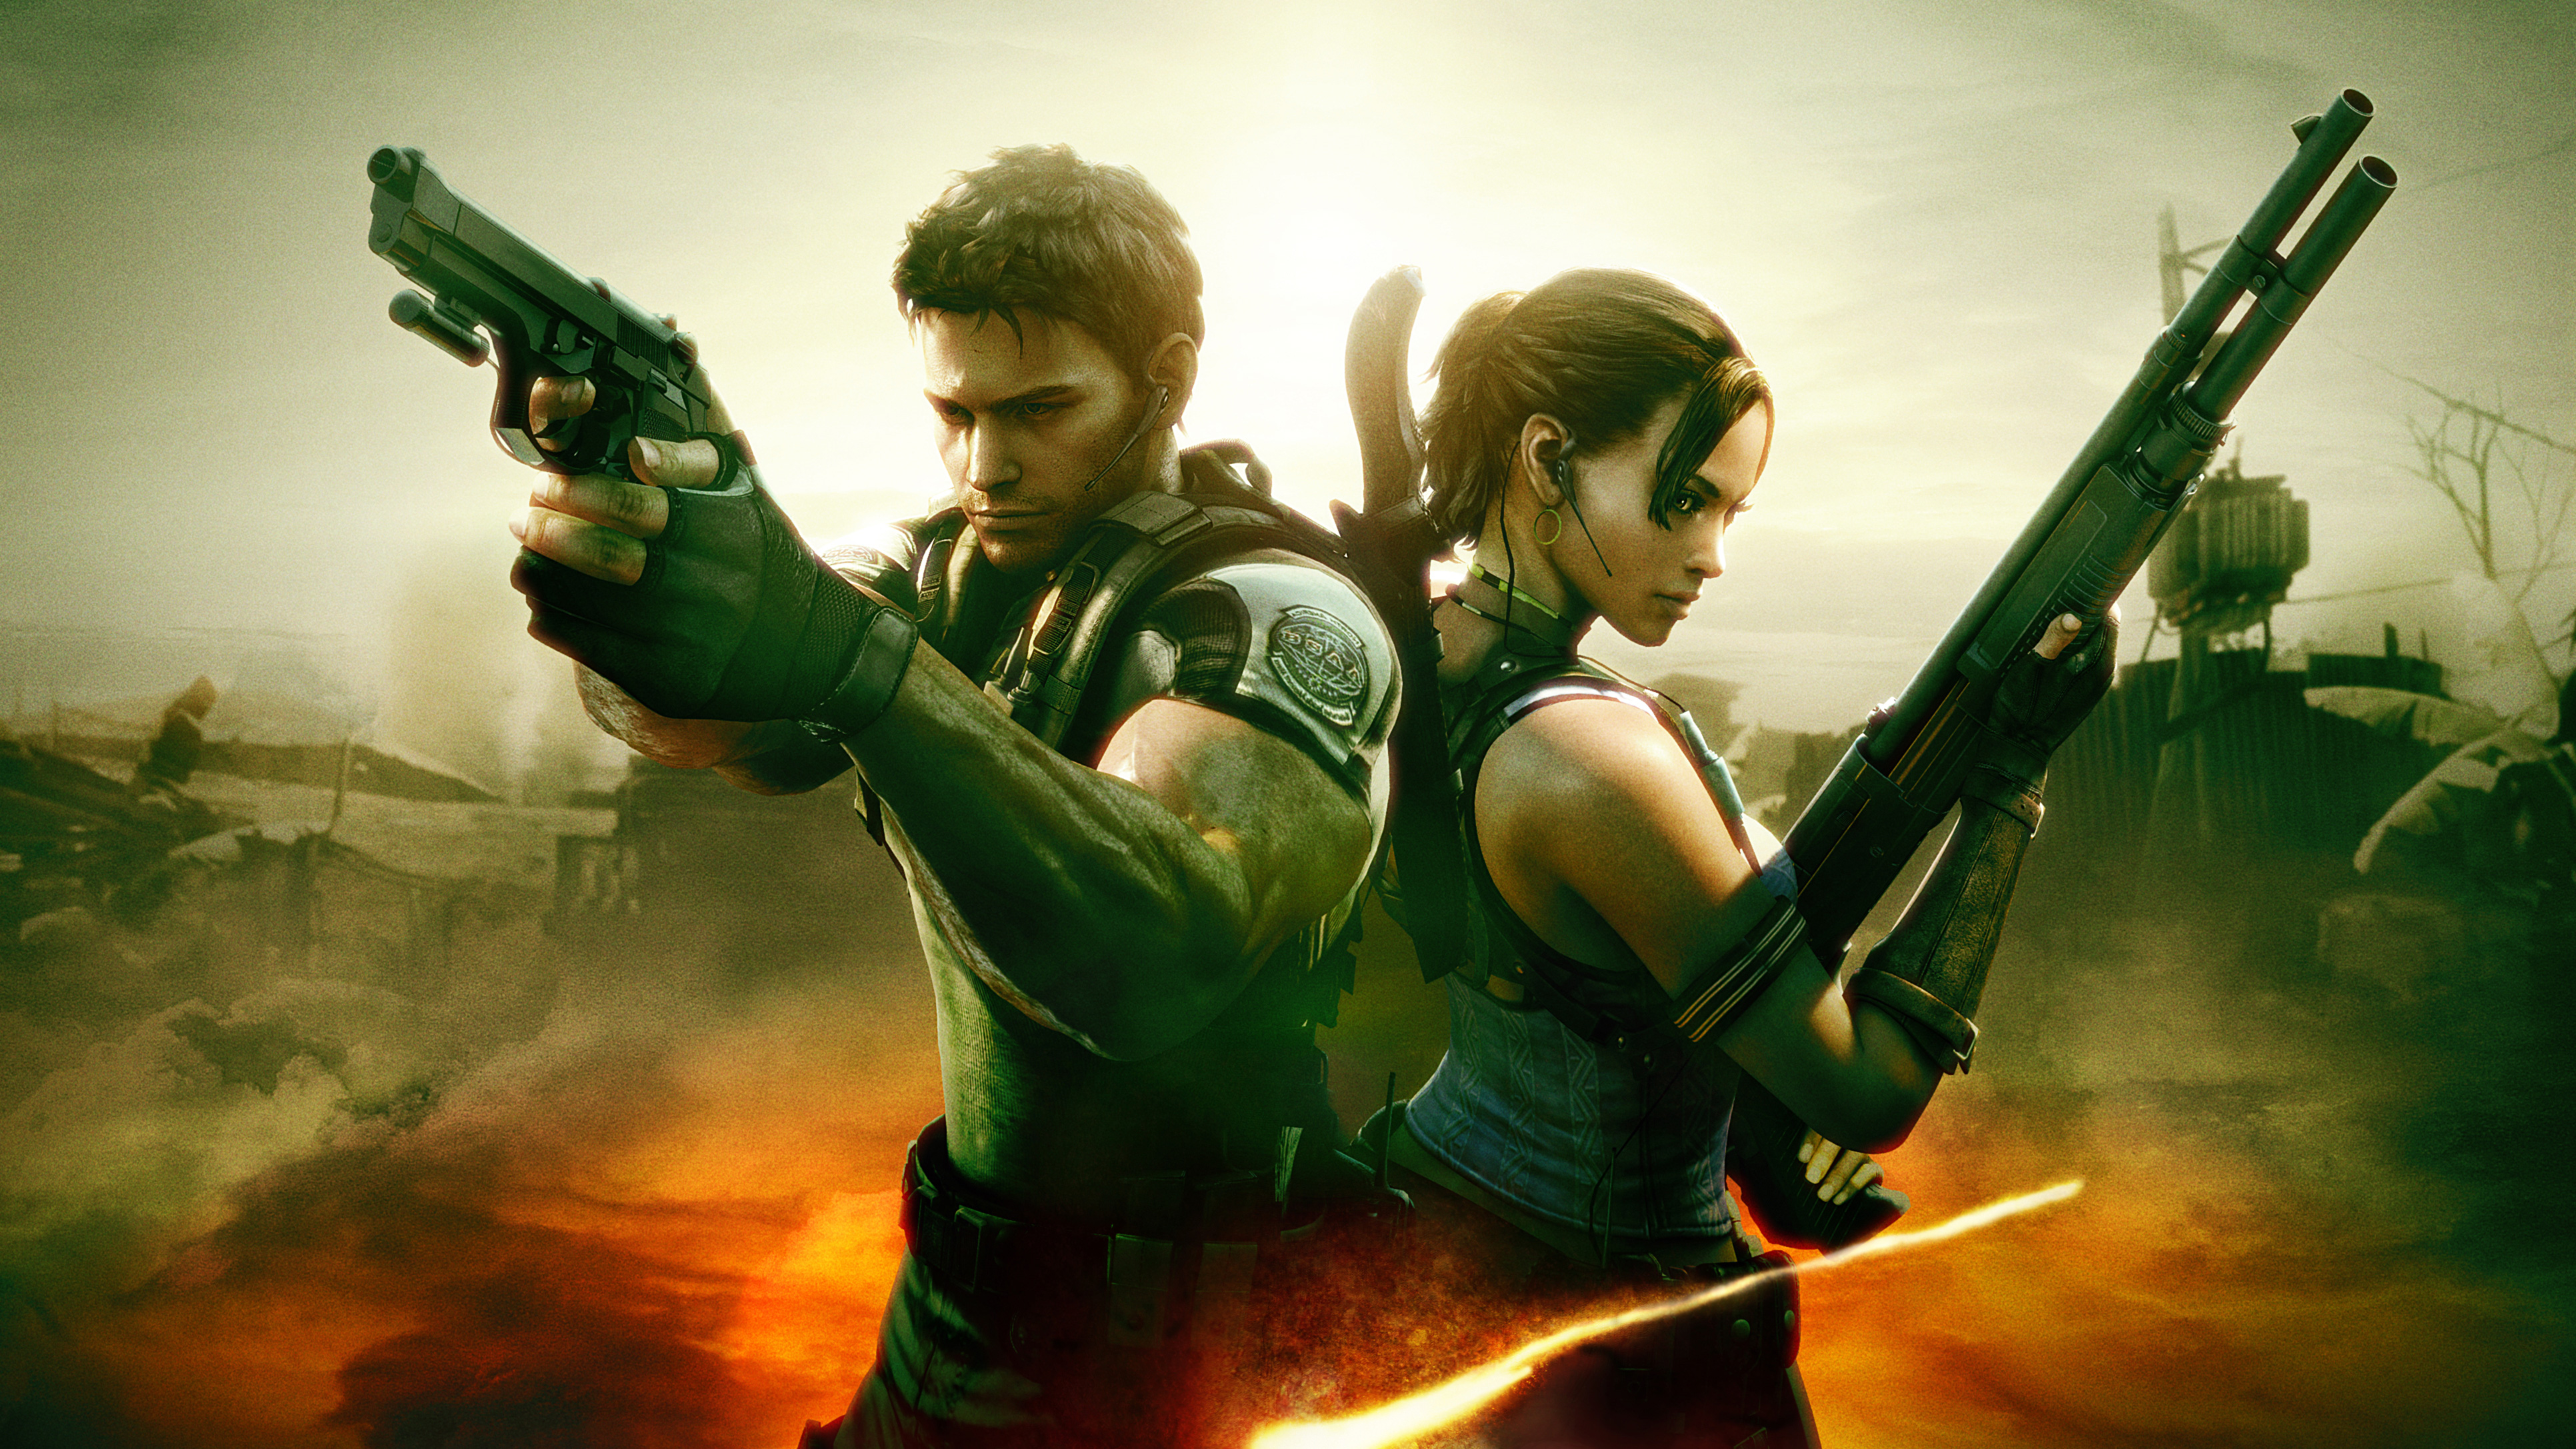 Resident Evil 5 4k, HD Games, 4k Wallpapers, Images ...